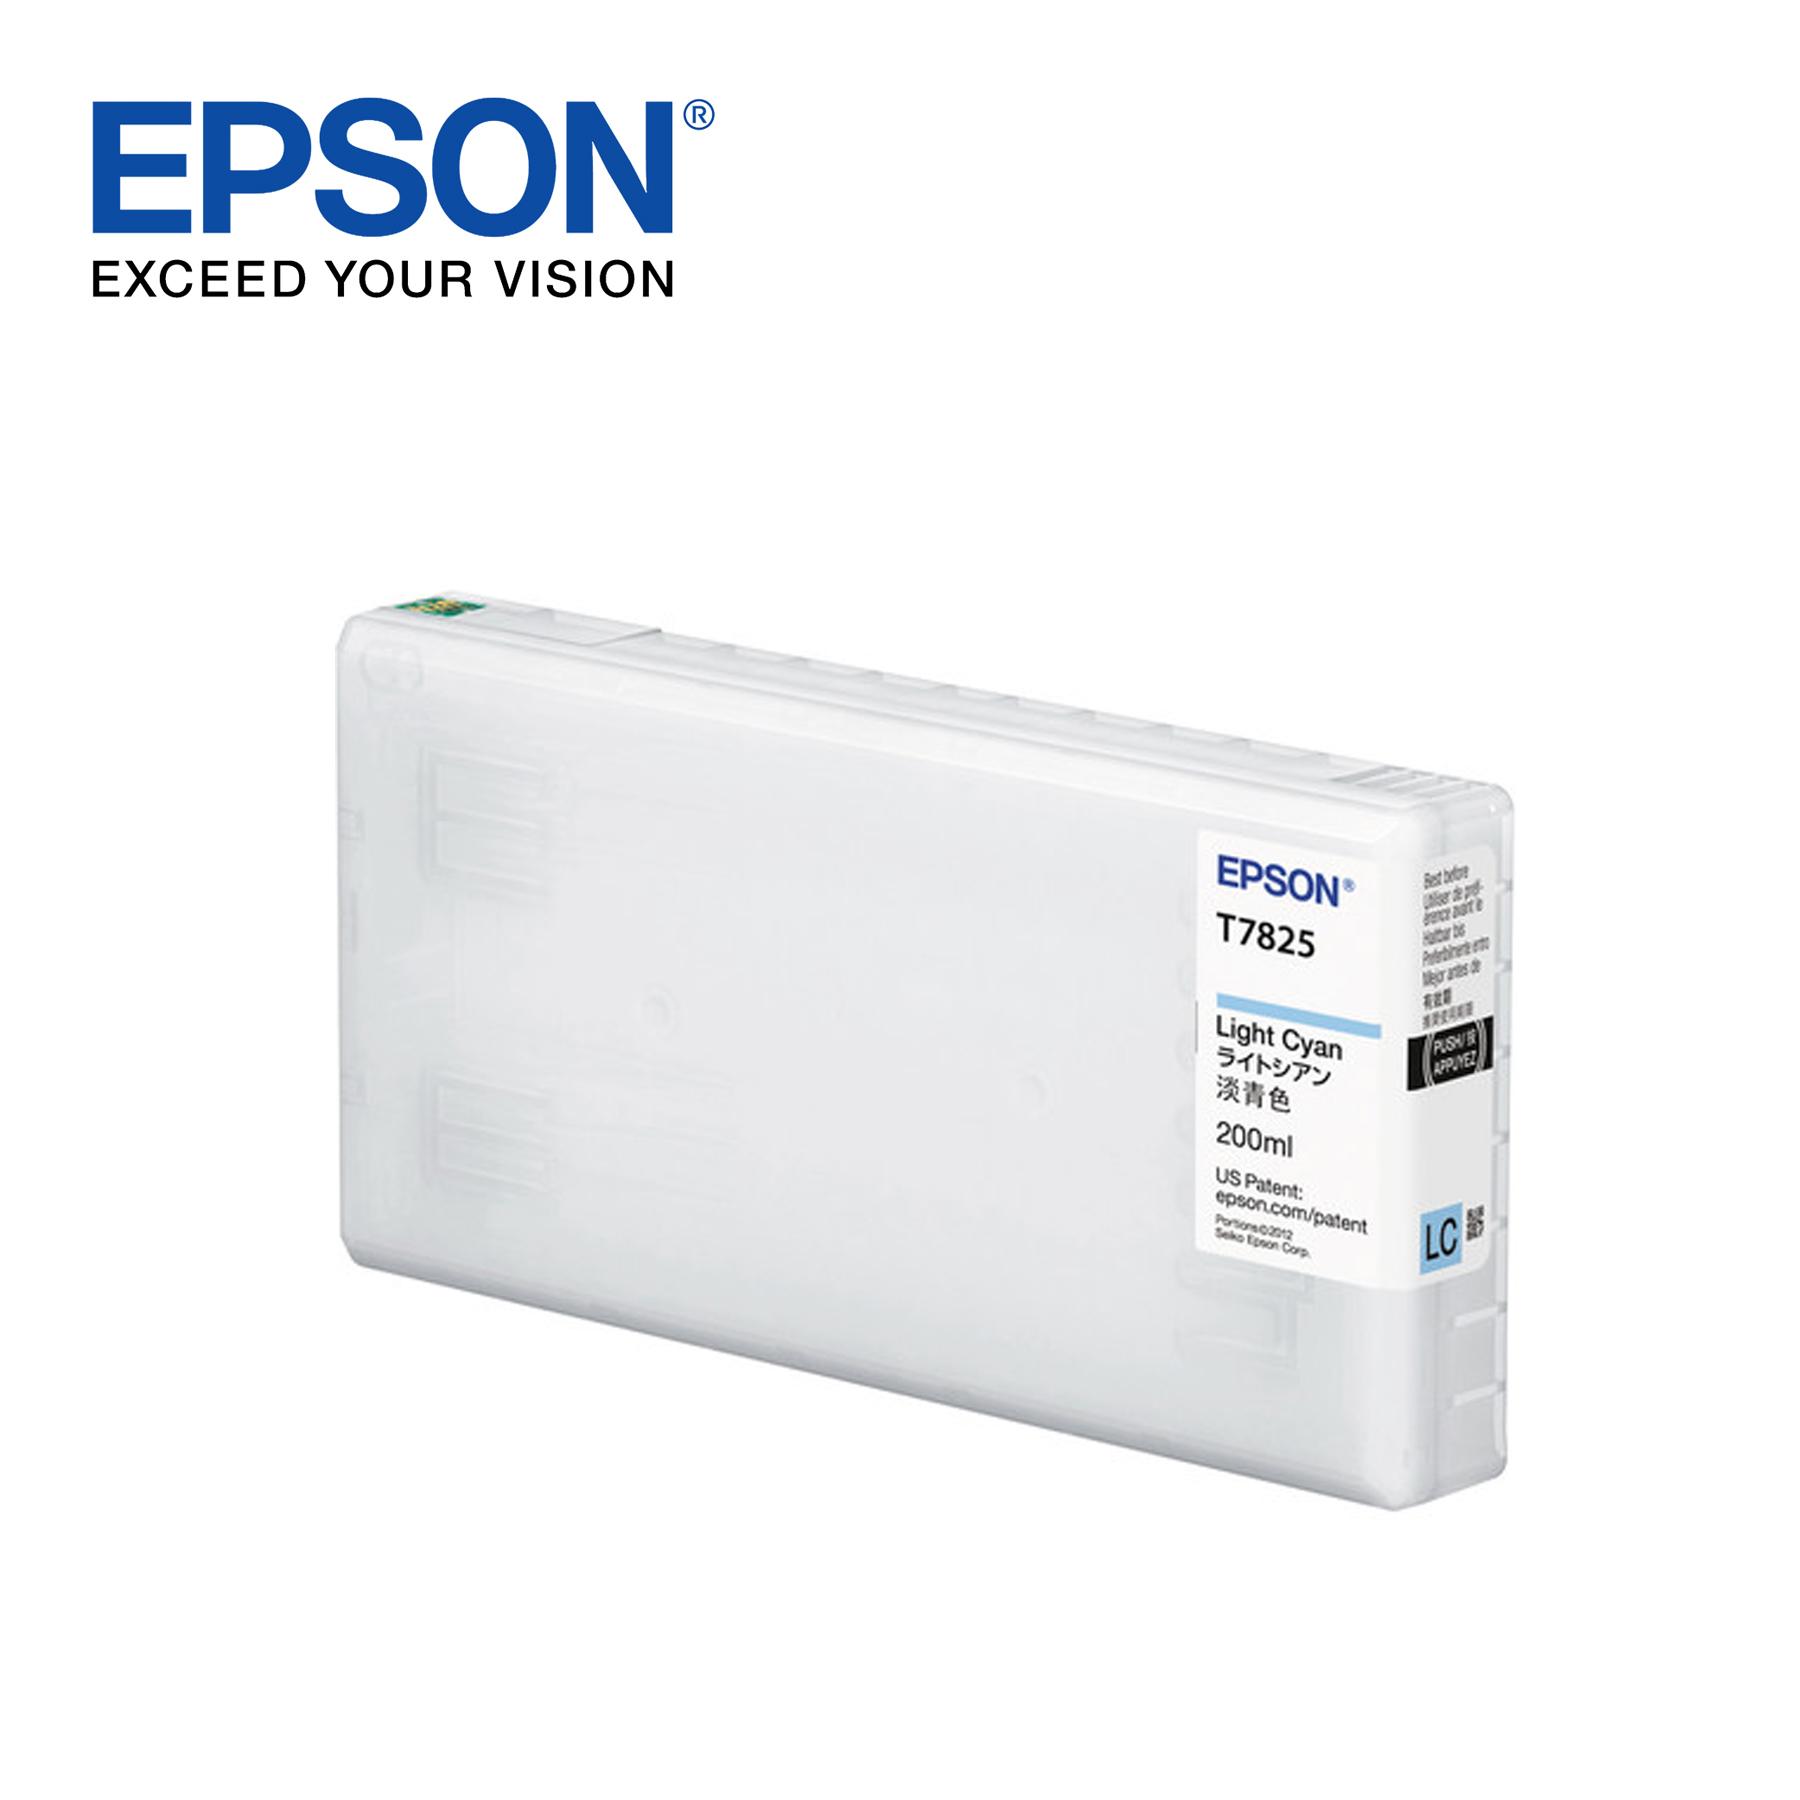 Epson Ink Cartridge for Surelab SL-D700 Photo Printer – Light Cyan